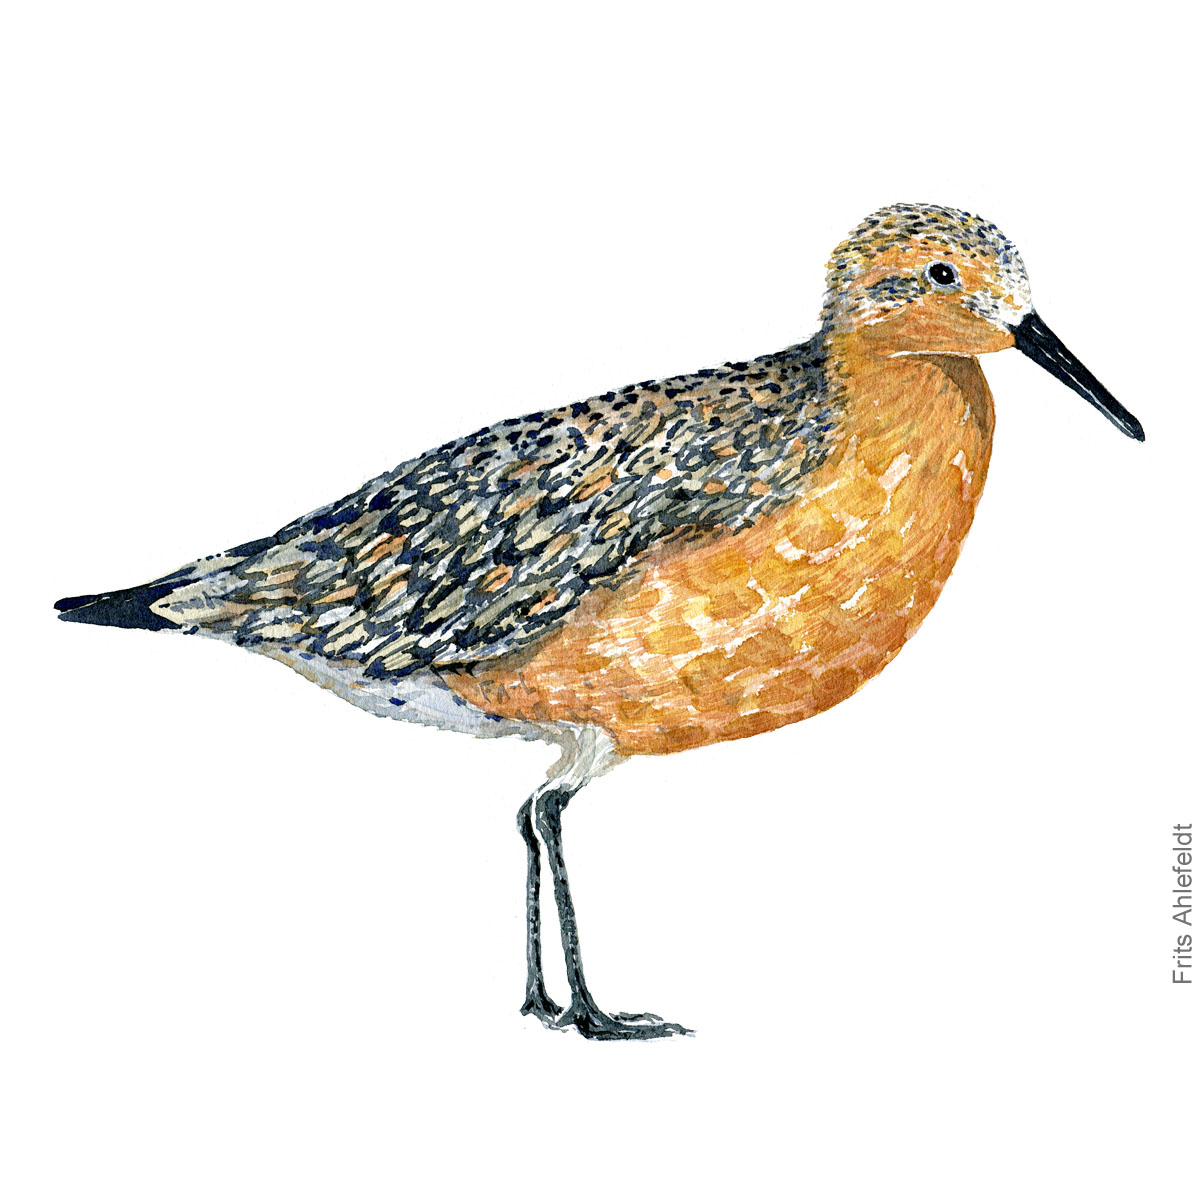 Islandsk ryle - Red knot bird watercolor painting. Artwork by Frits Ahlefeldt. Fugle akvarel